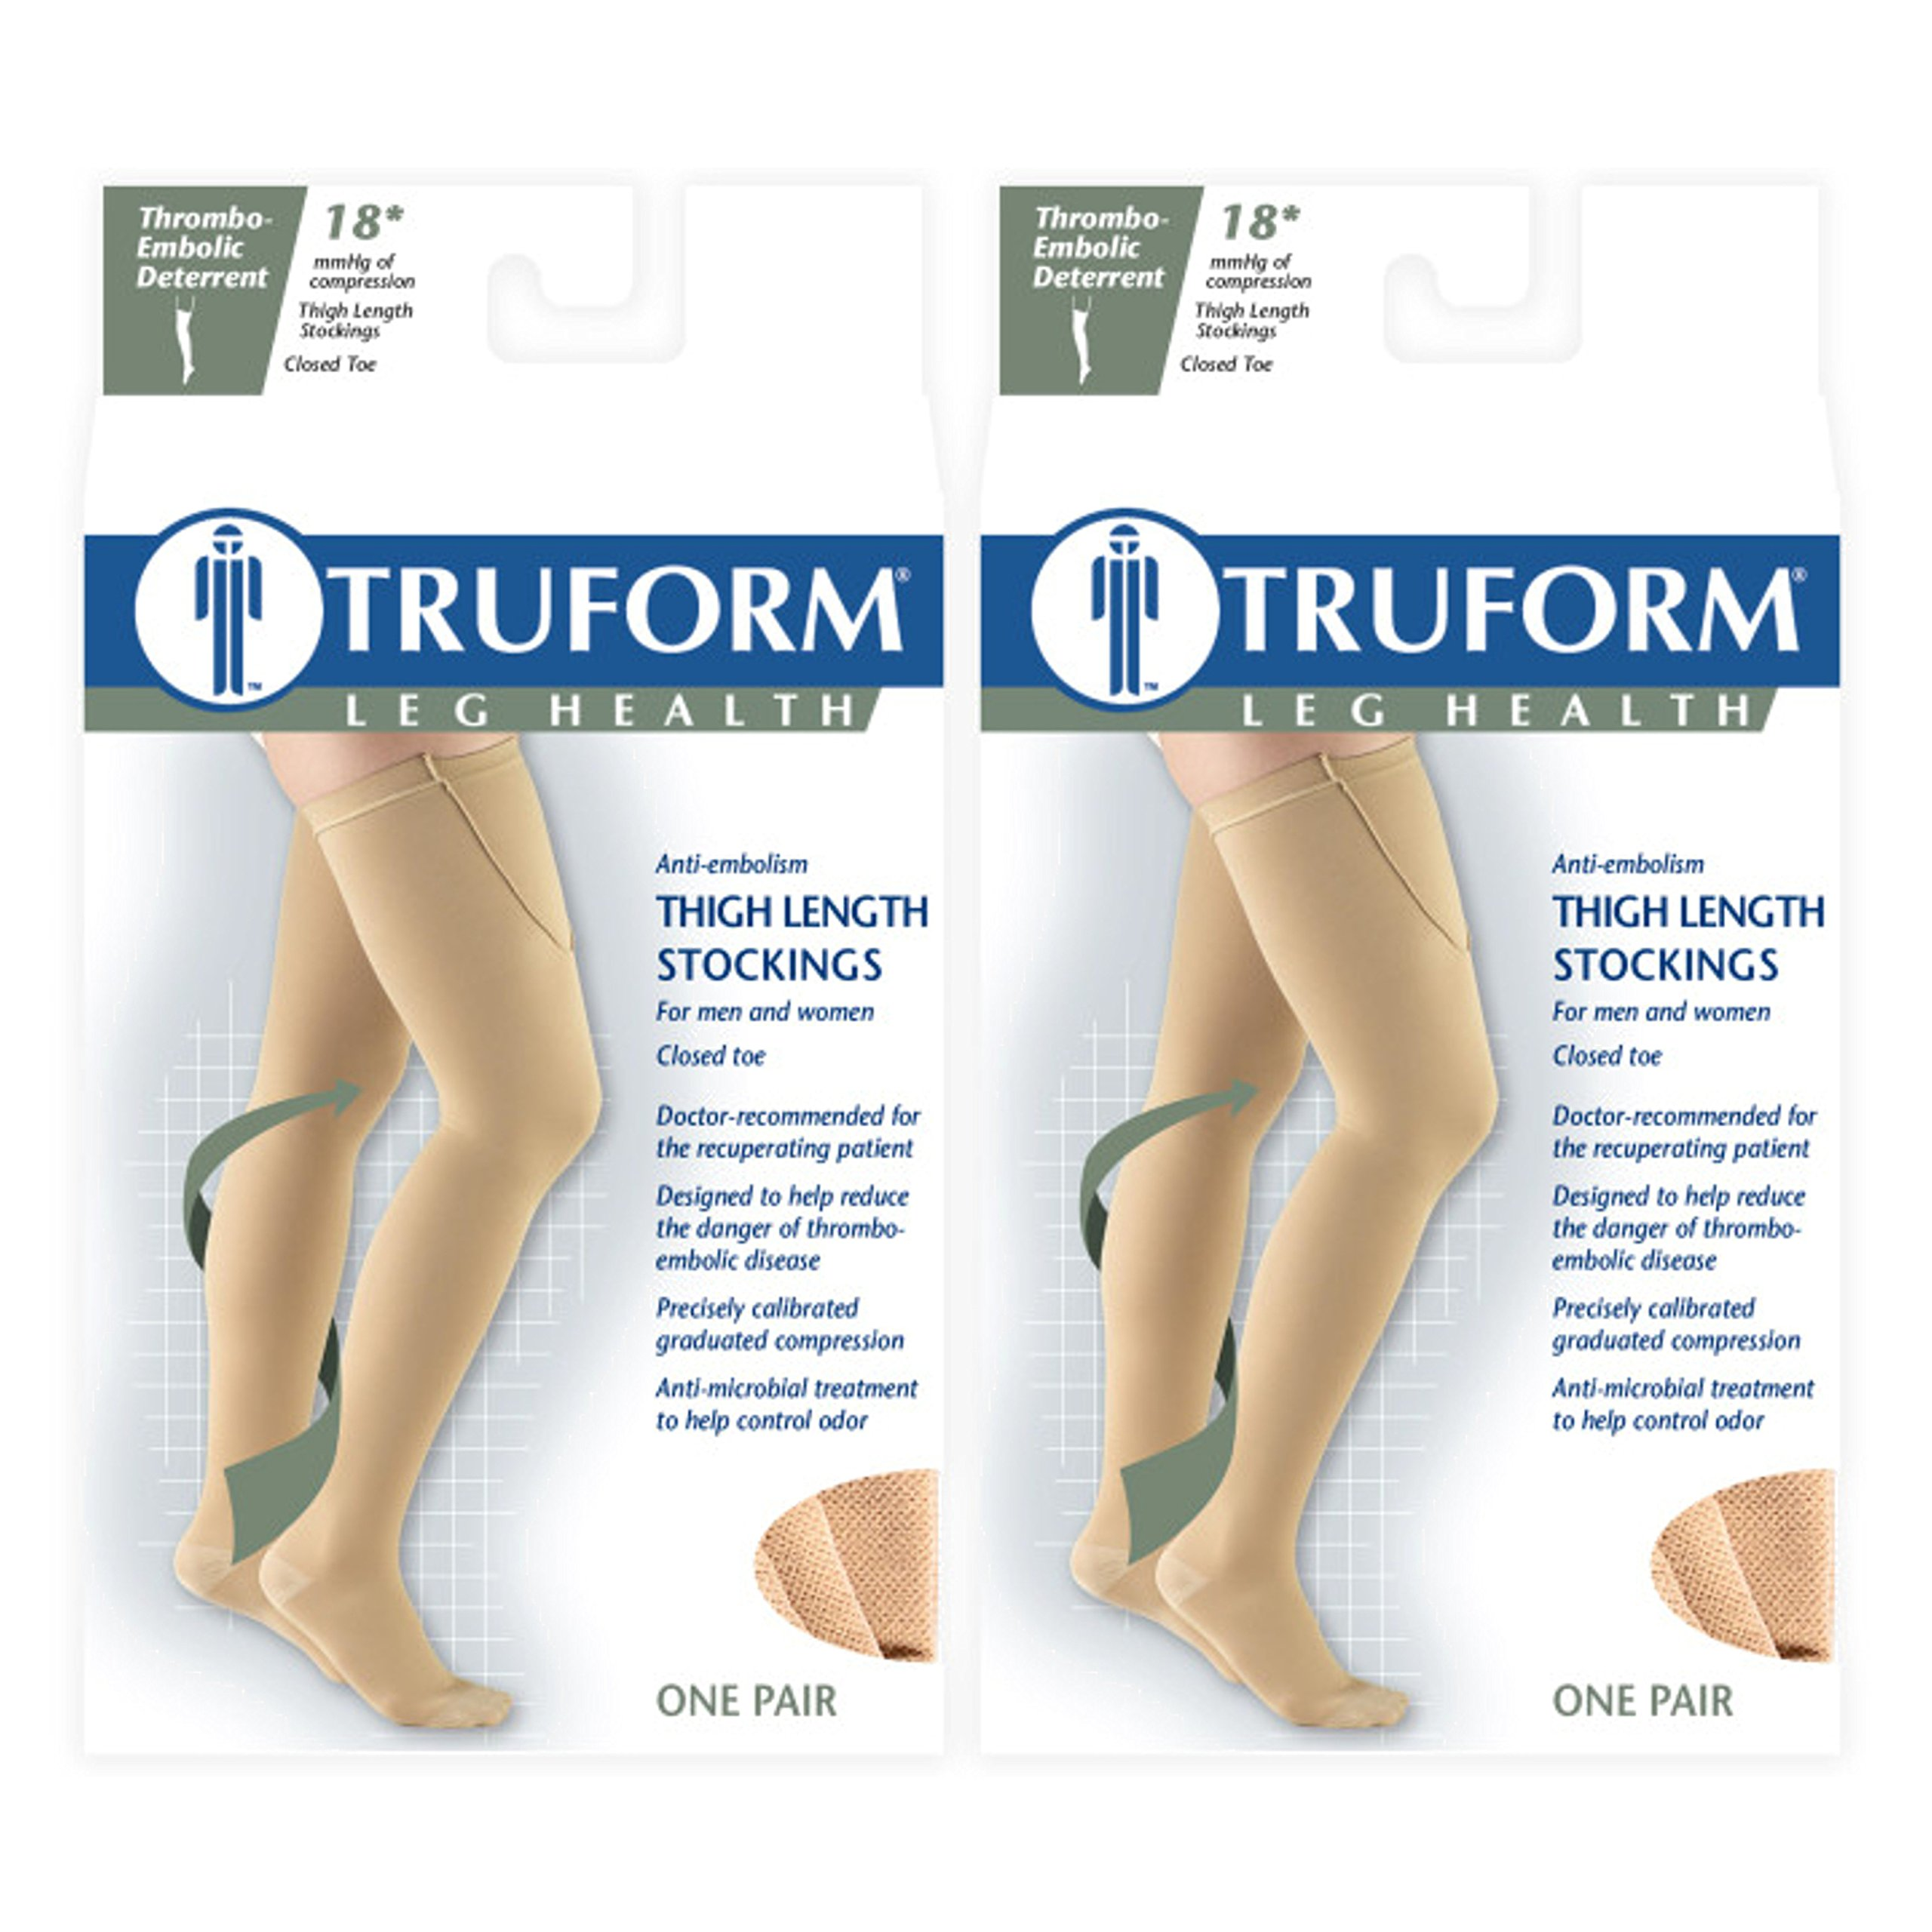 Truform Anti-Embolism 18 mmHg Thigh High Stockings Black, Large, 2 Count